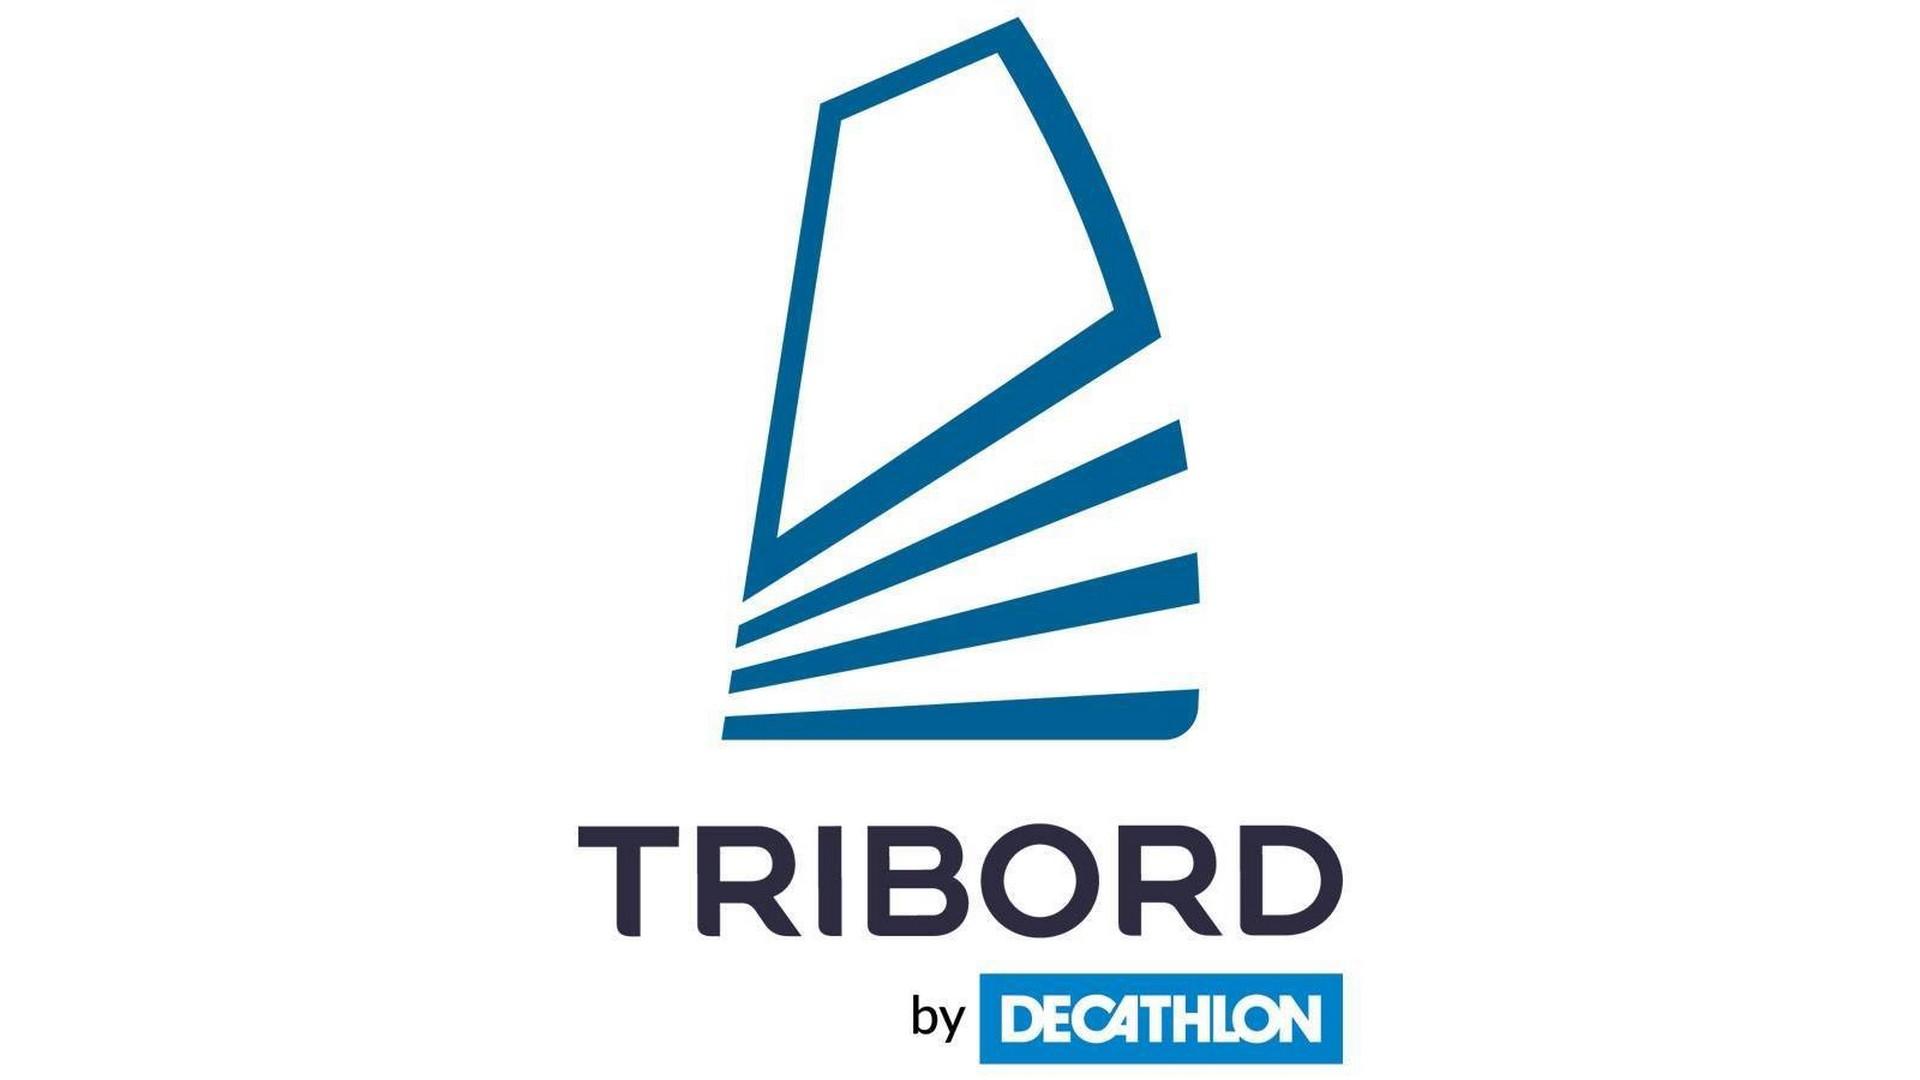 Tribord Décathlon logo (1)